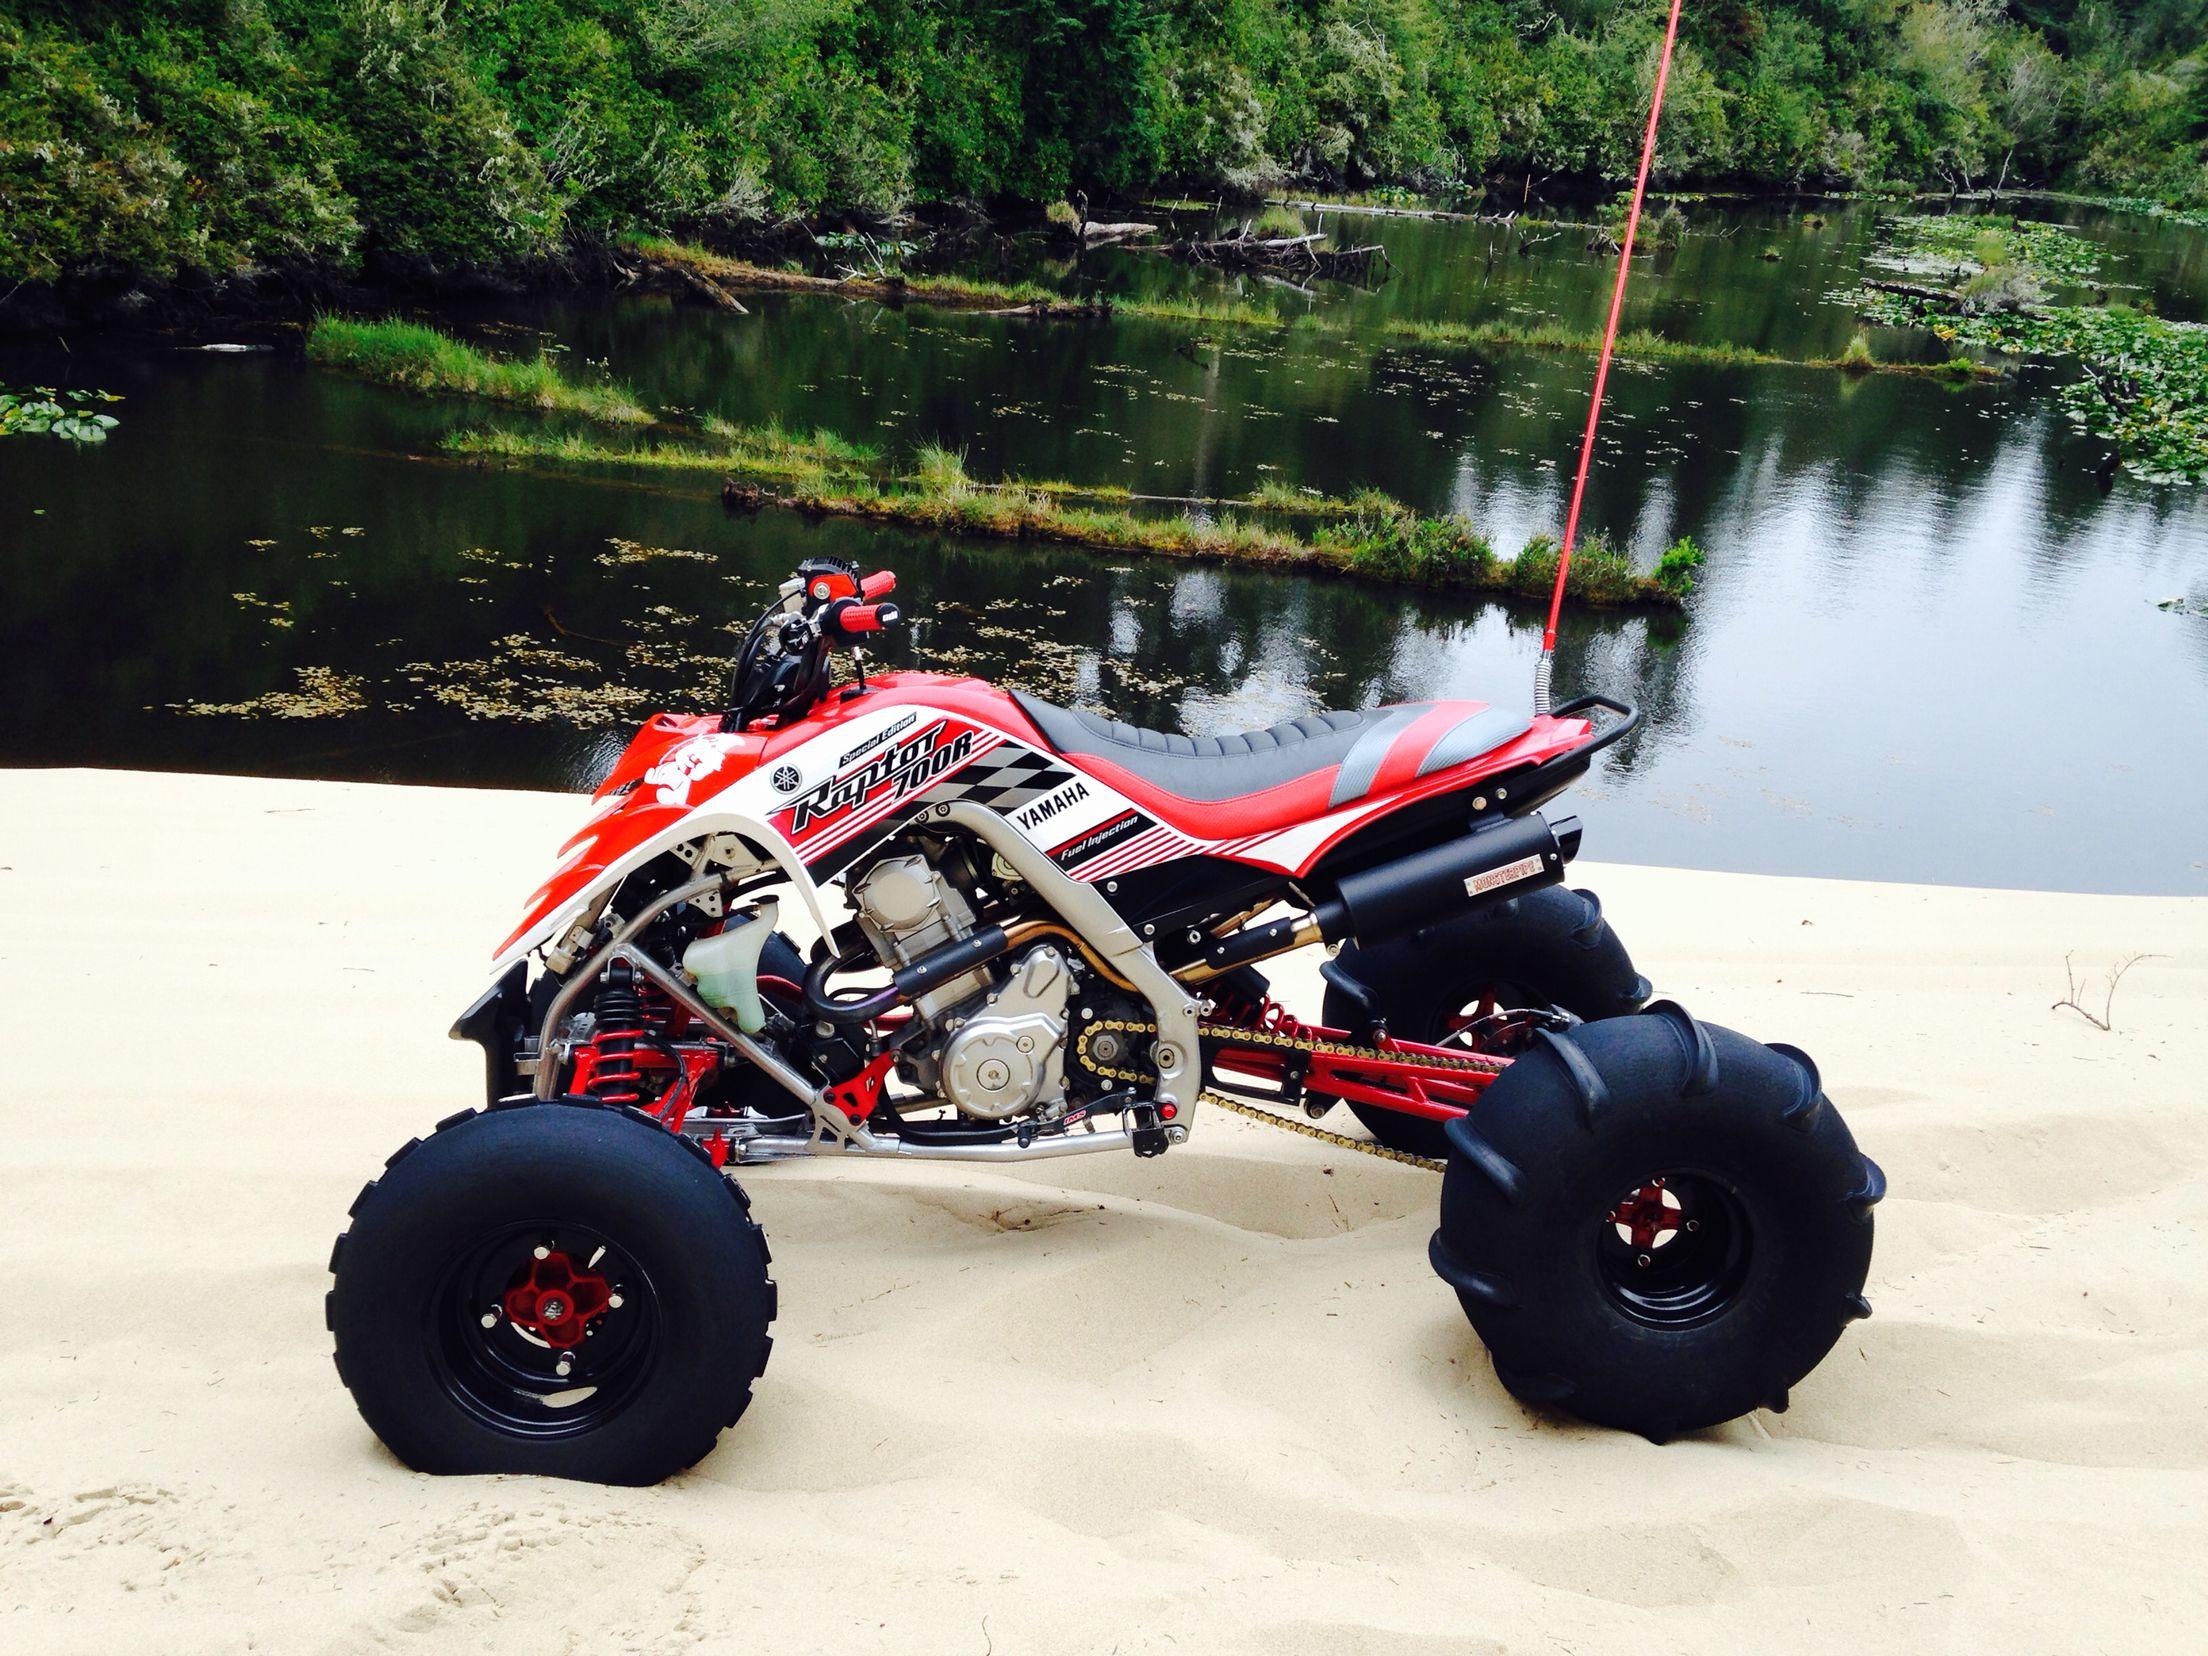 Raptor 700 Beast